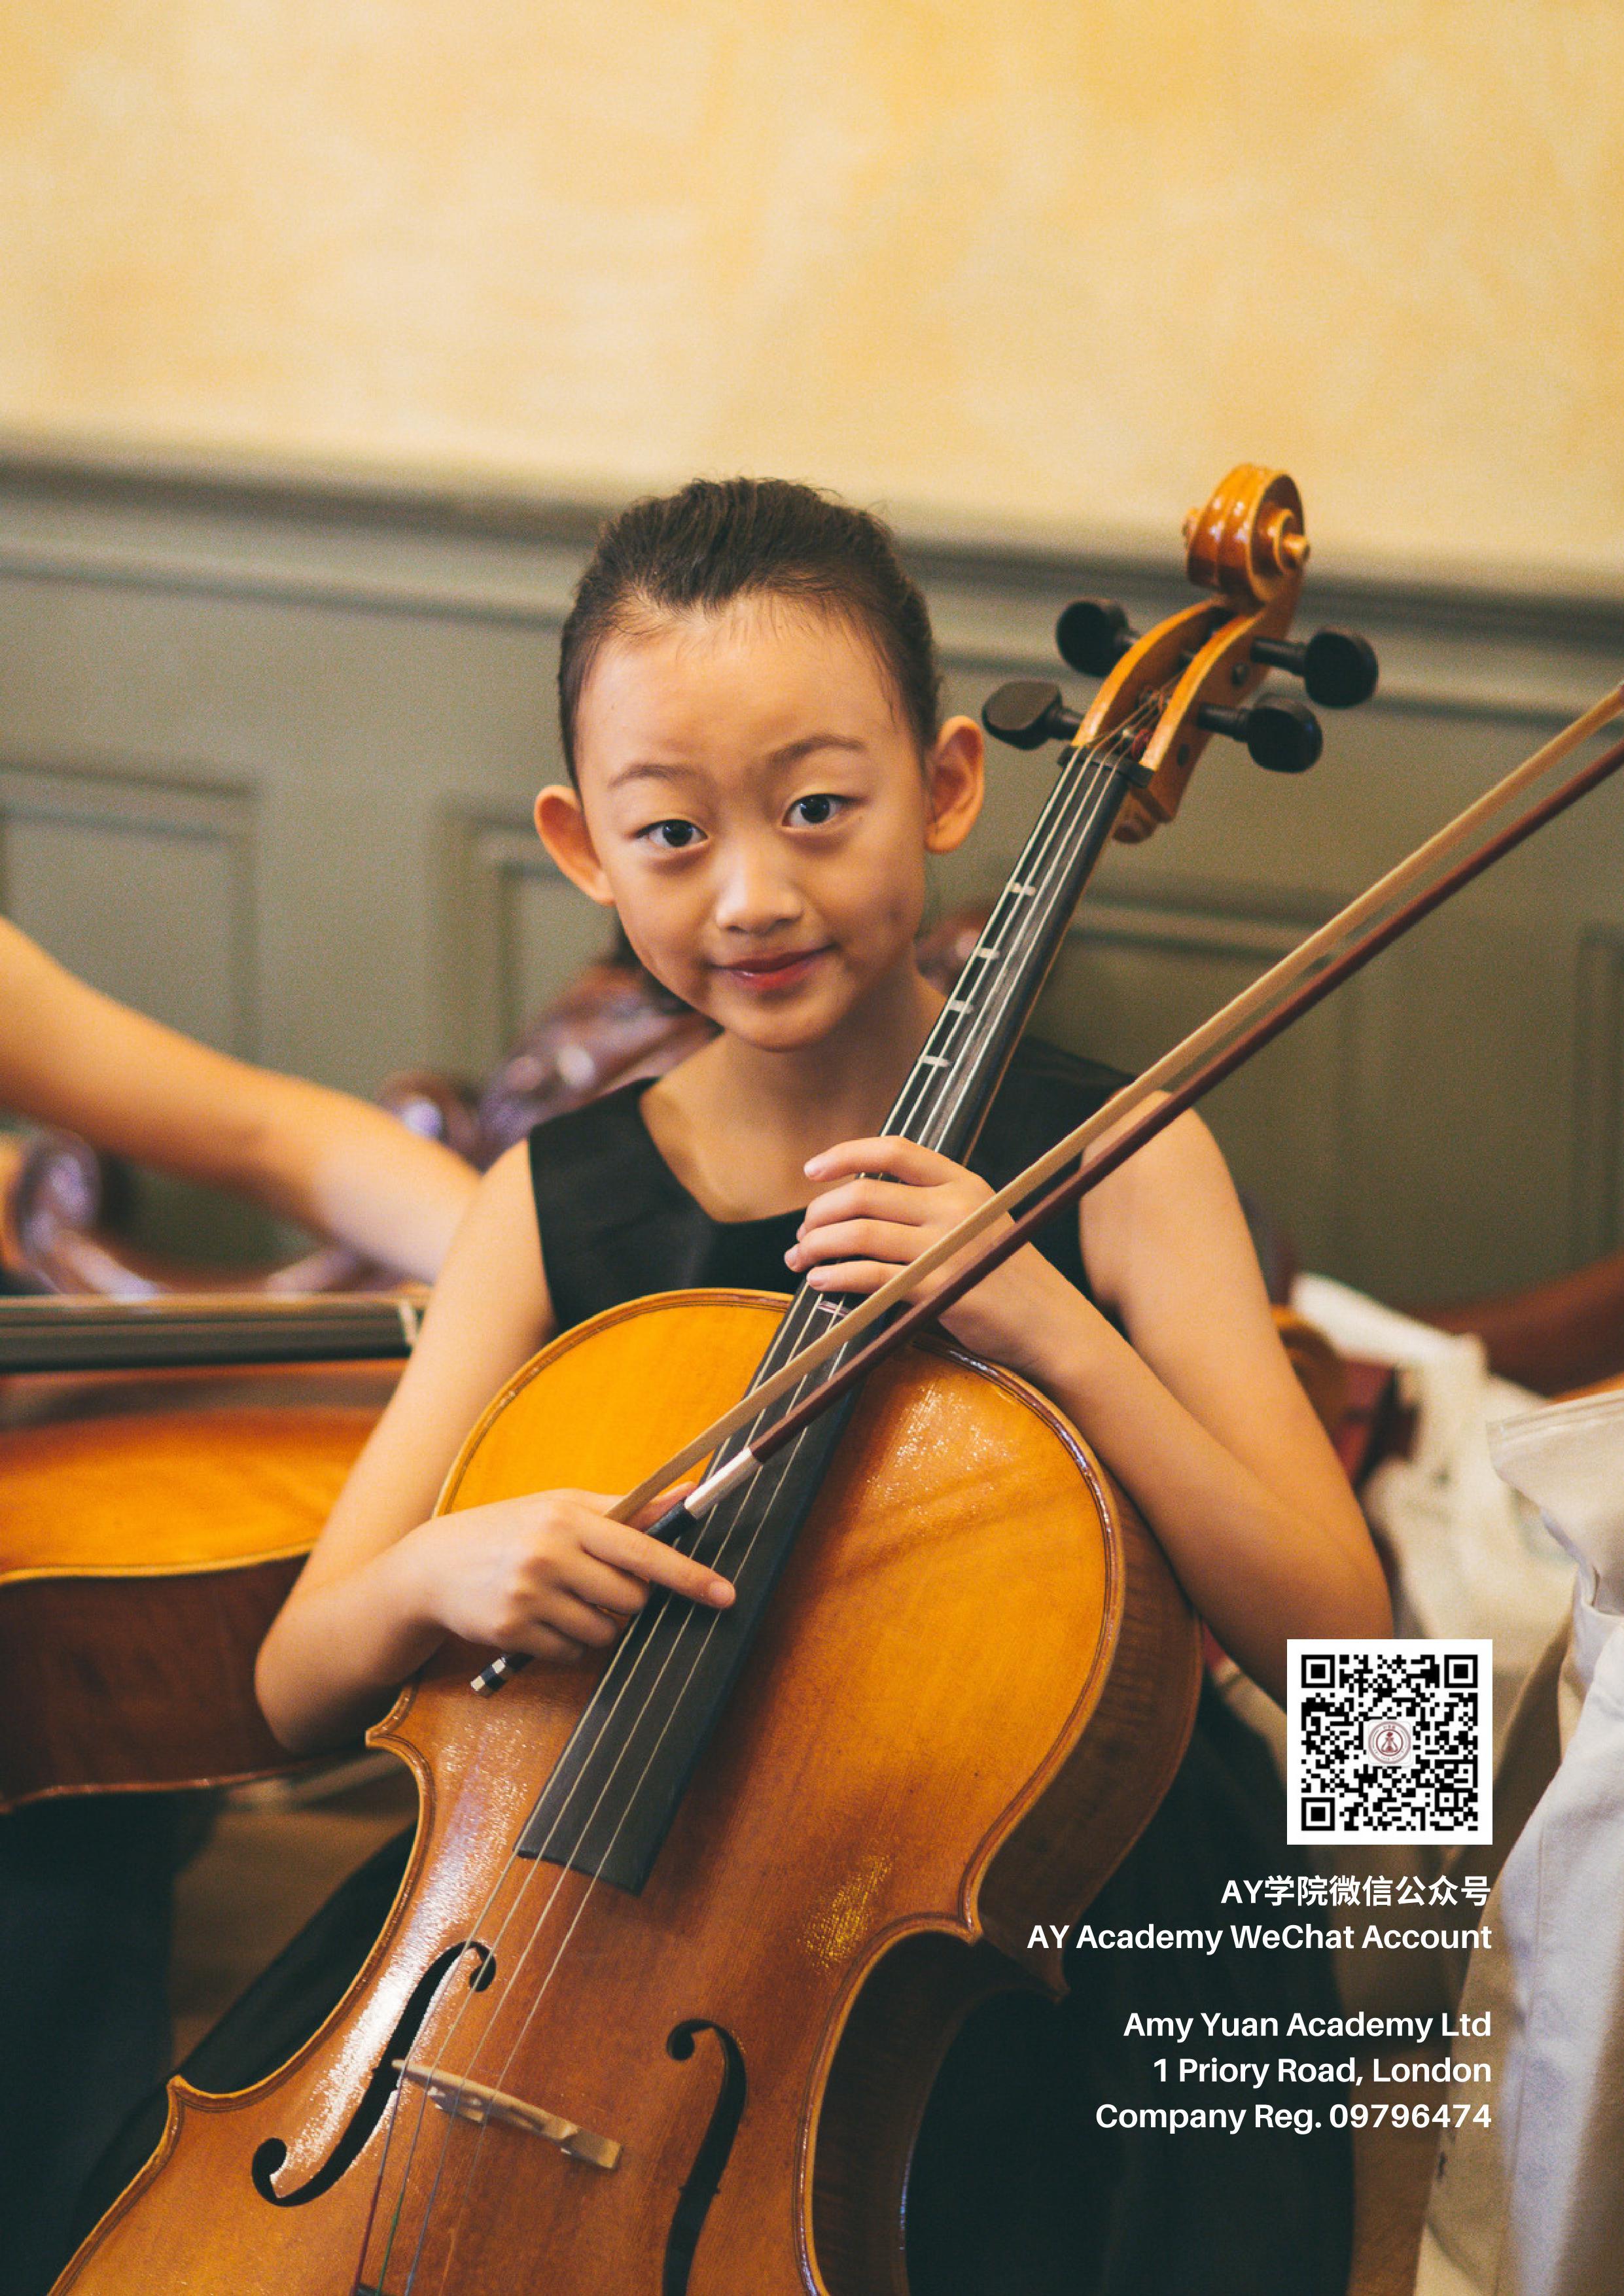 Amy Yuan Academy 2019 Brochure17.jpg